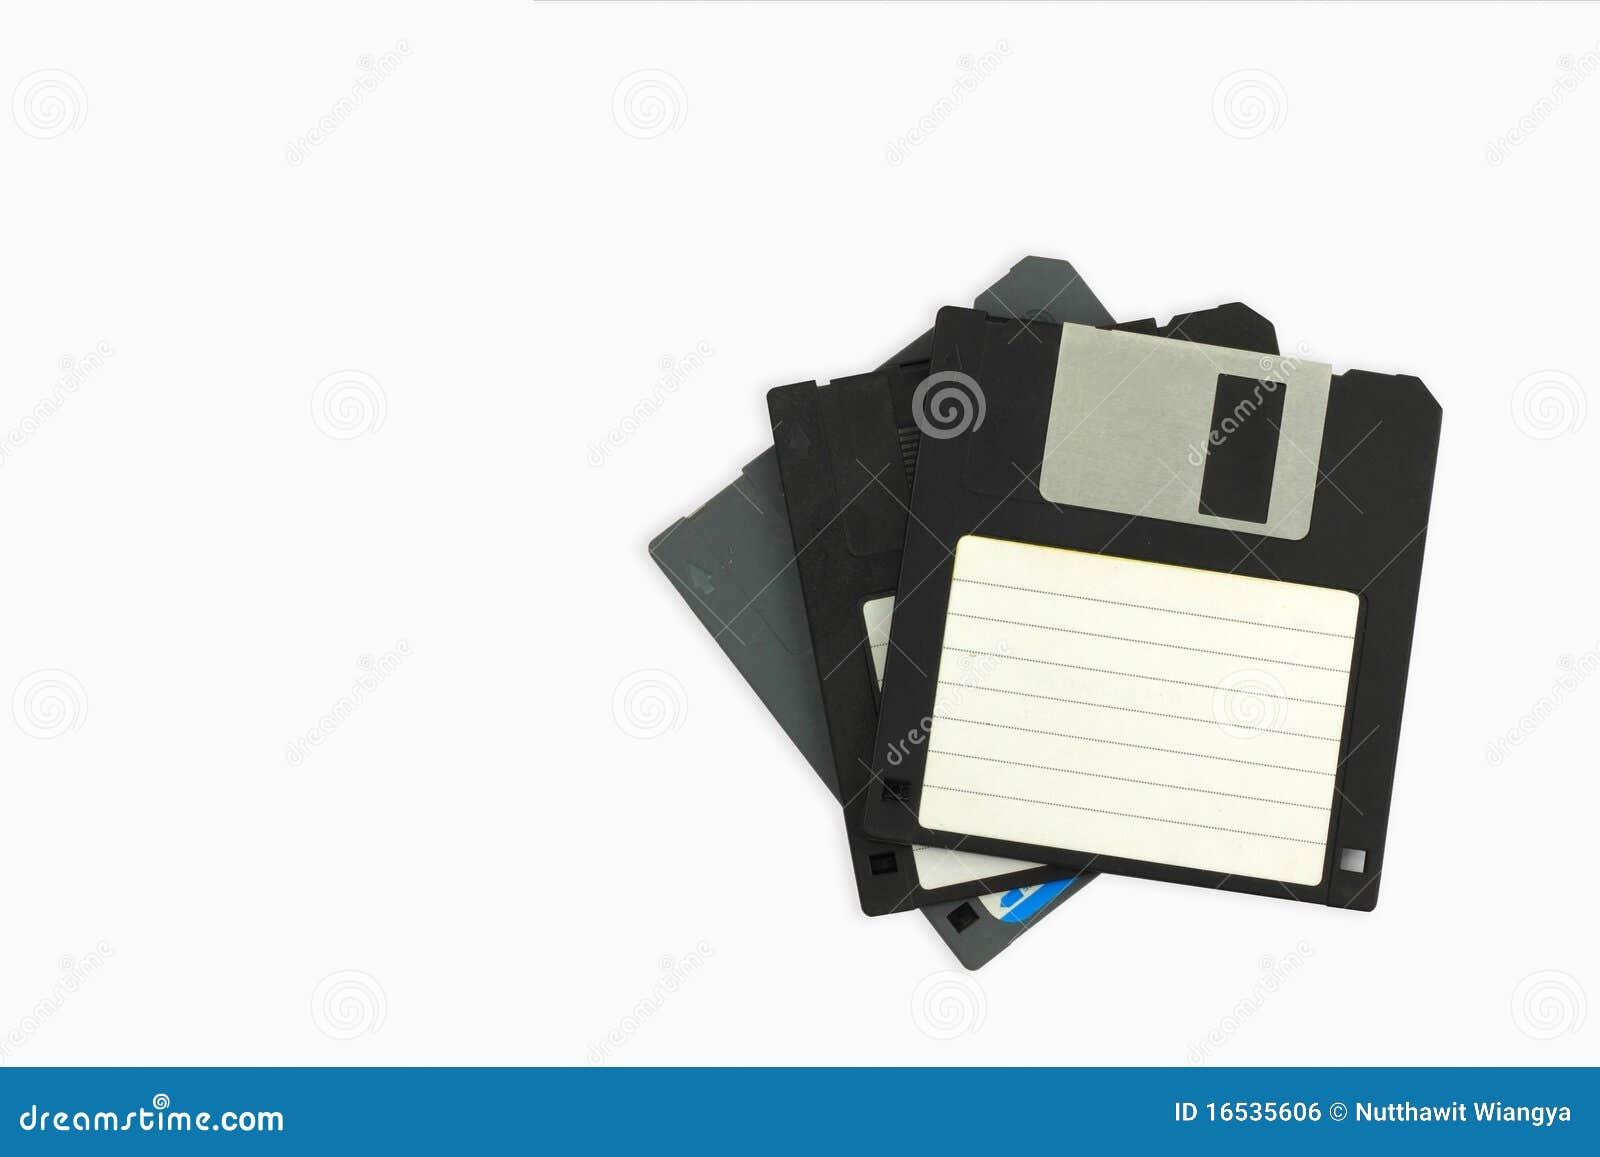 Old floppy disks i royalty free stock image image 16535606 - Uses for old floppy disks ...